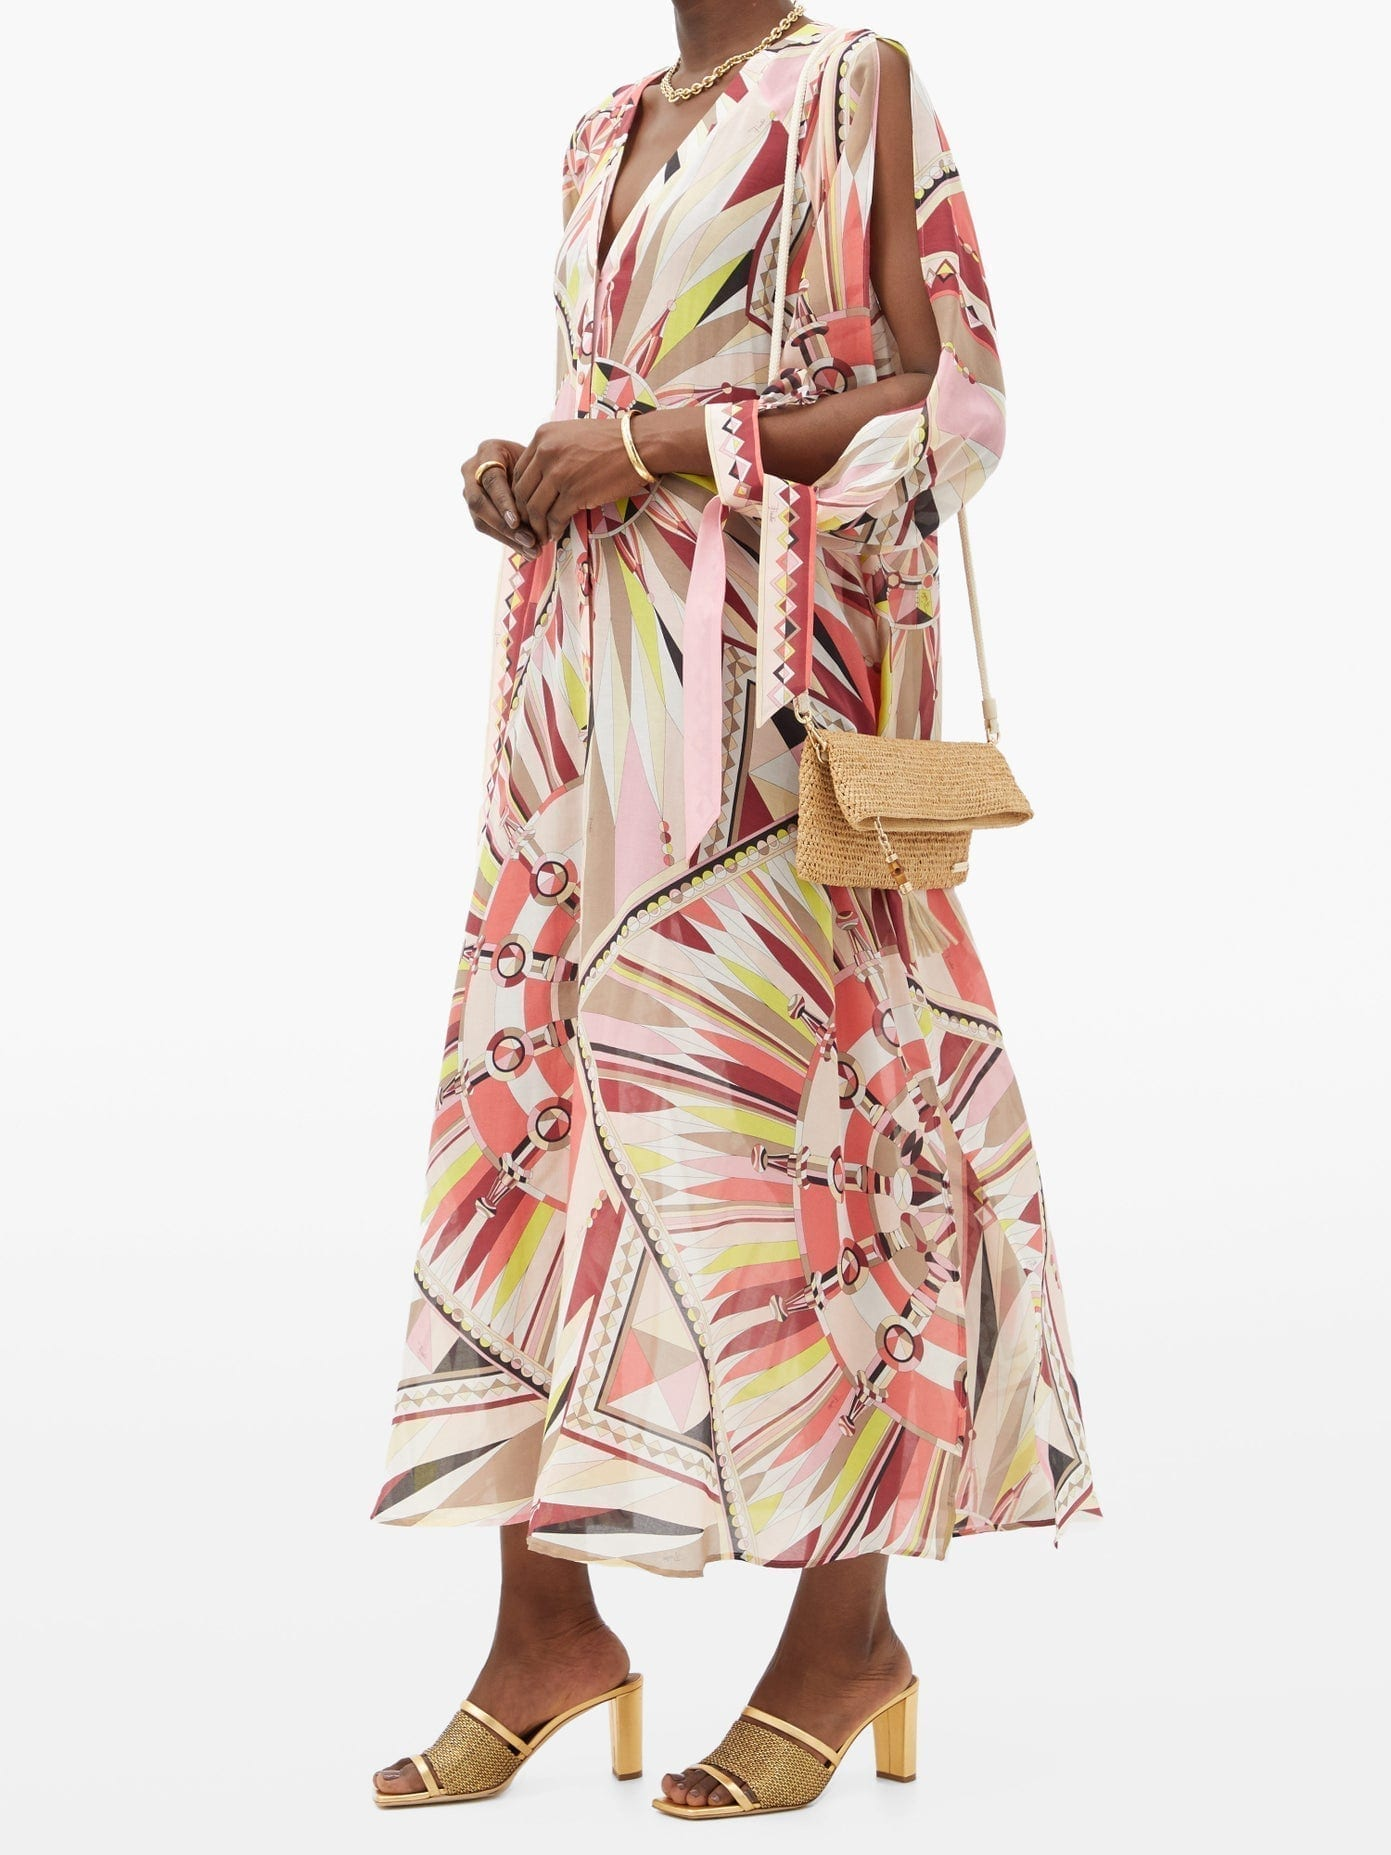 EMILIO PUCCI Abstract-Print Cotton-Blend Dress